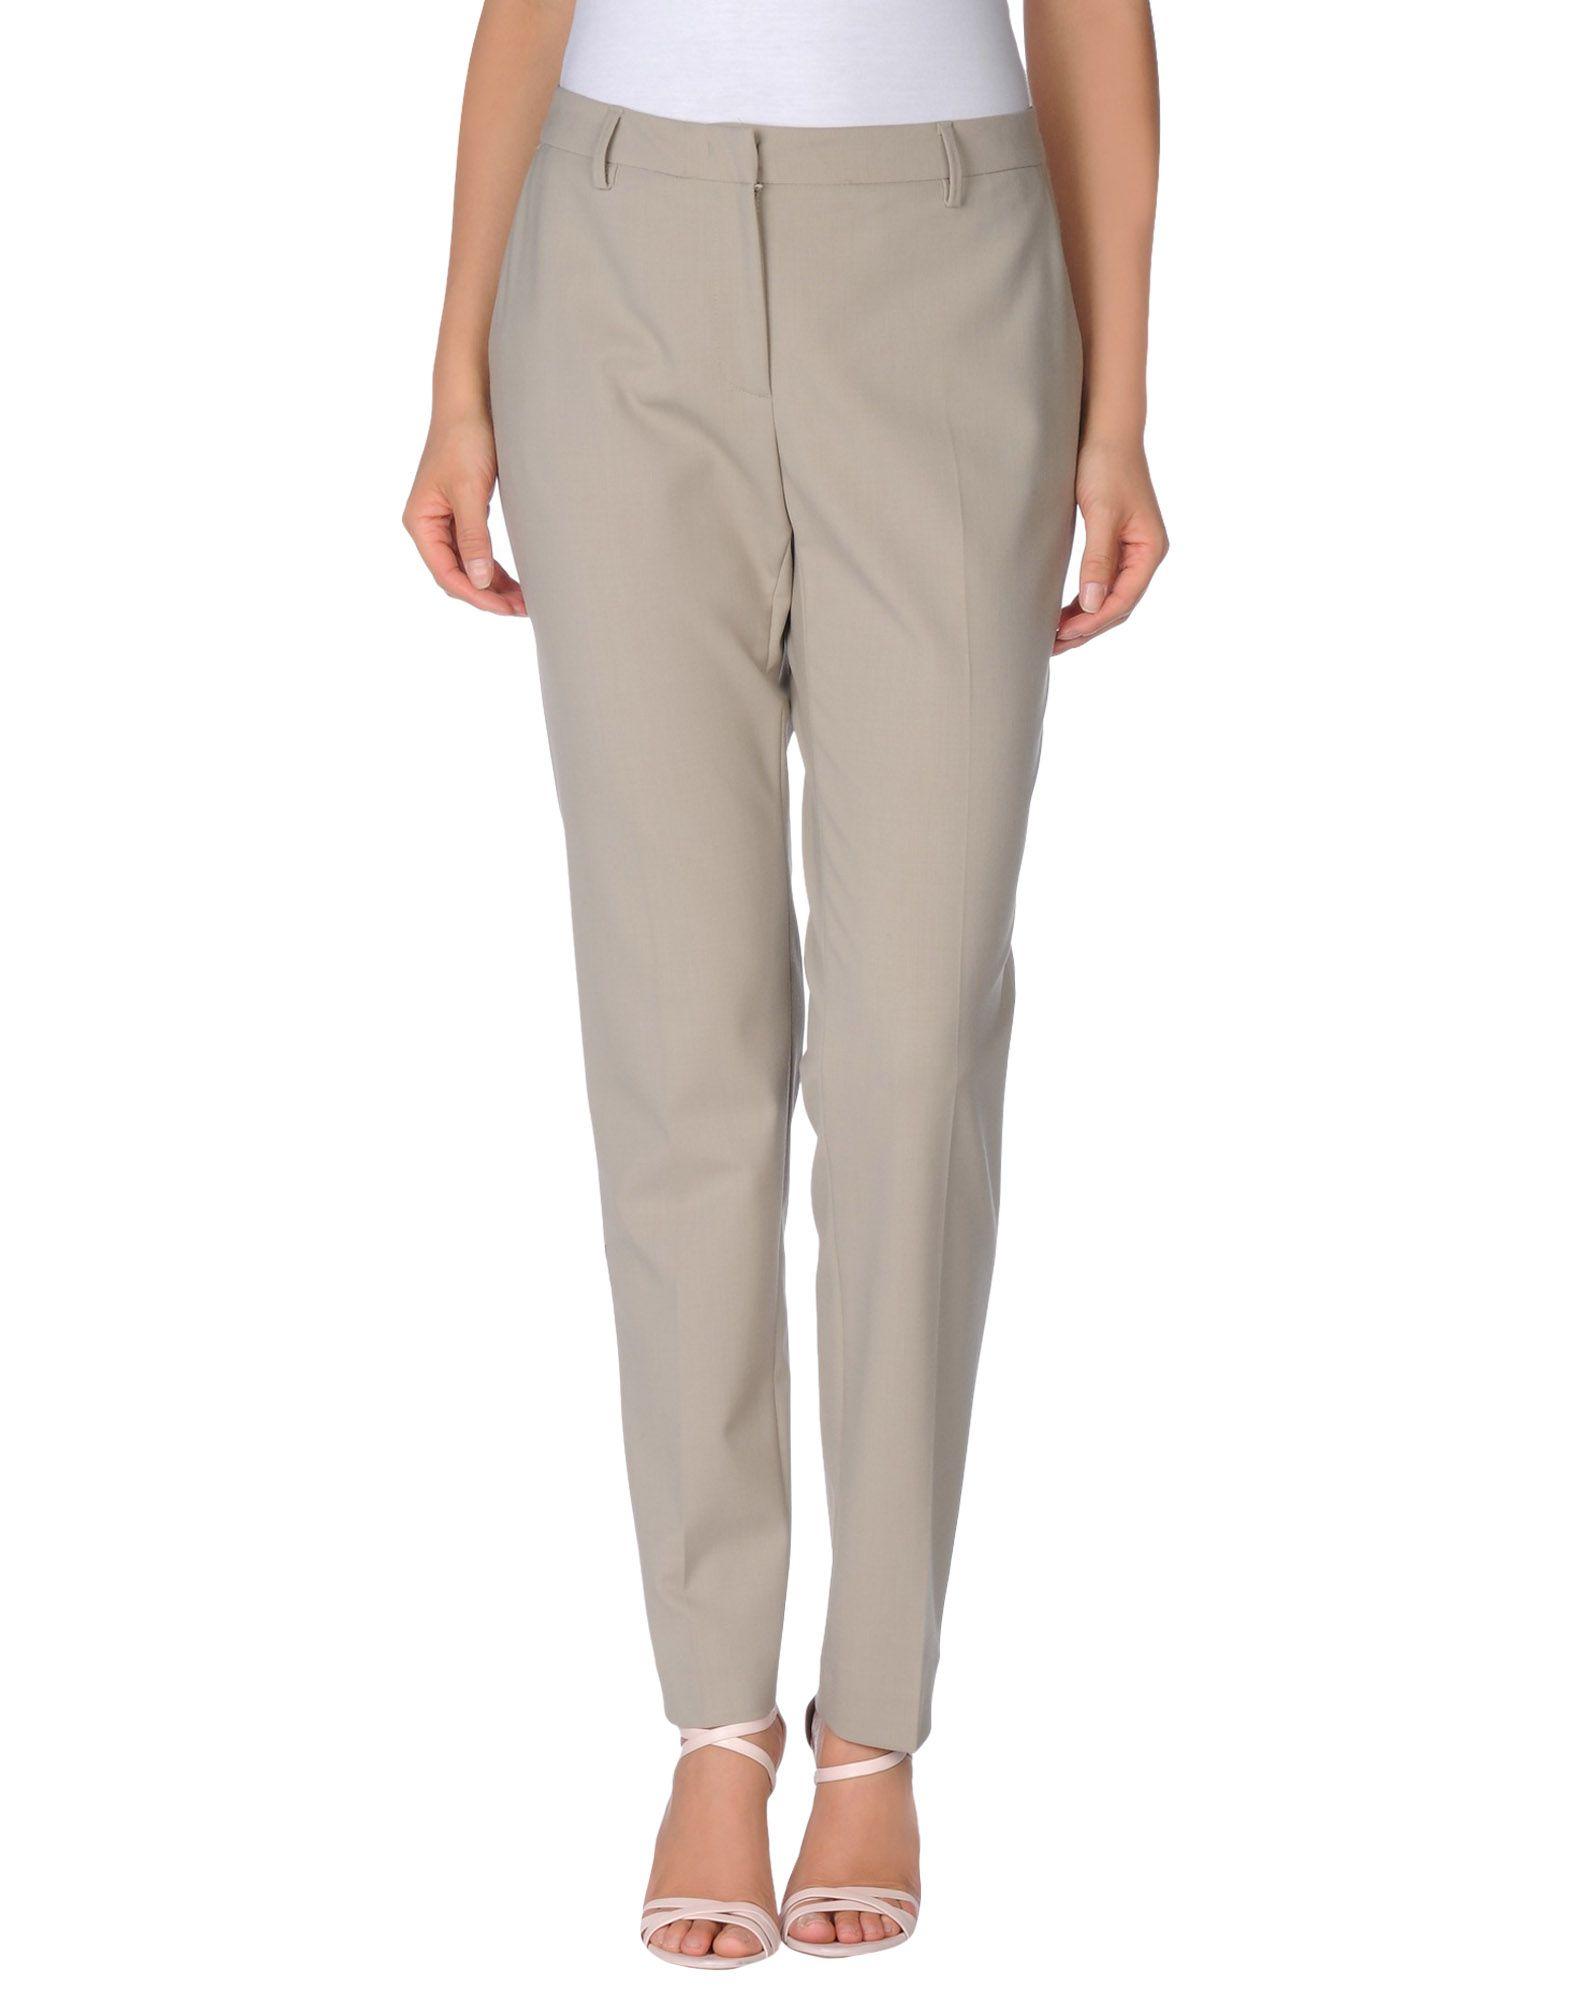 19.70 NINETEEN SEVENTY Casual pants